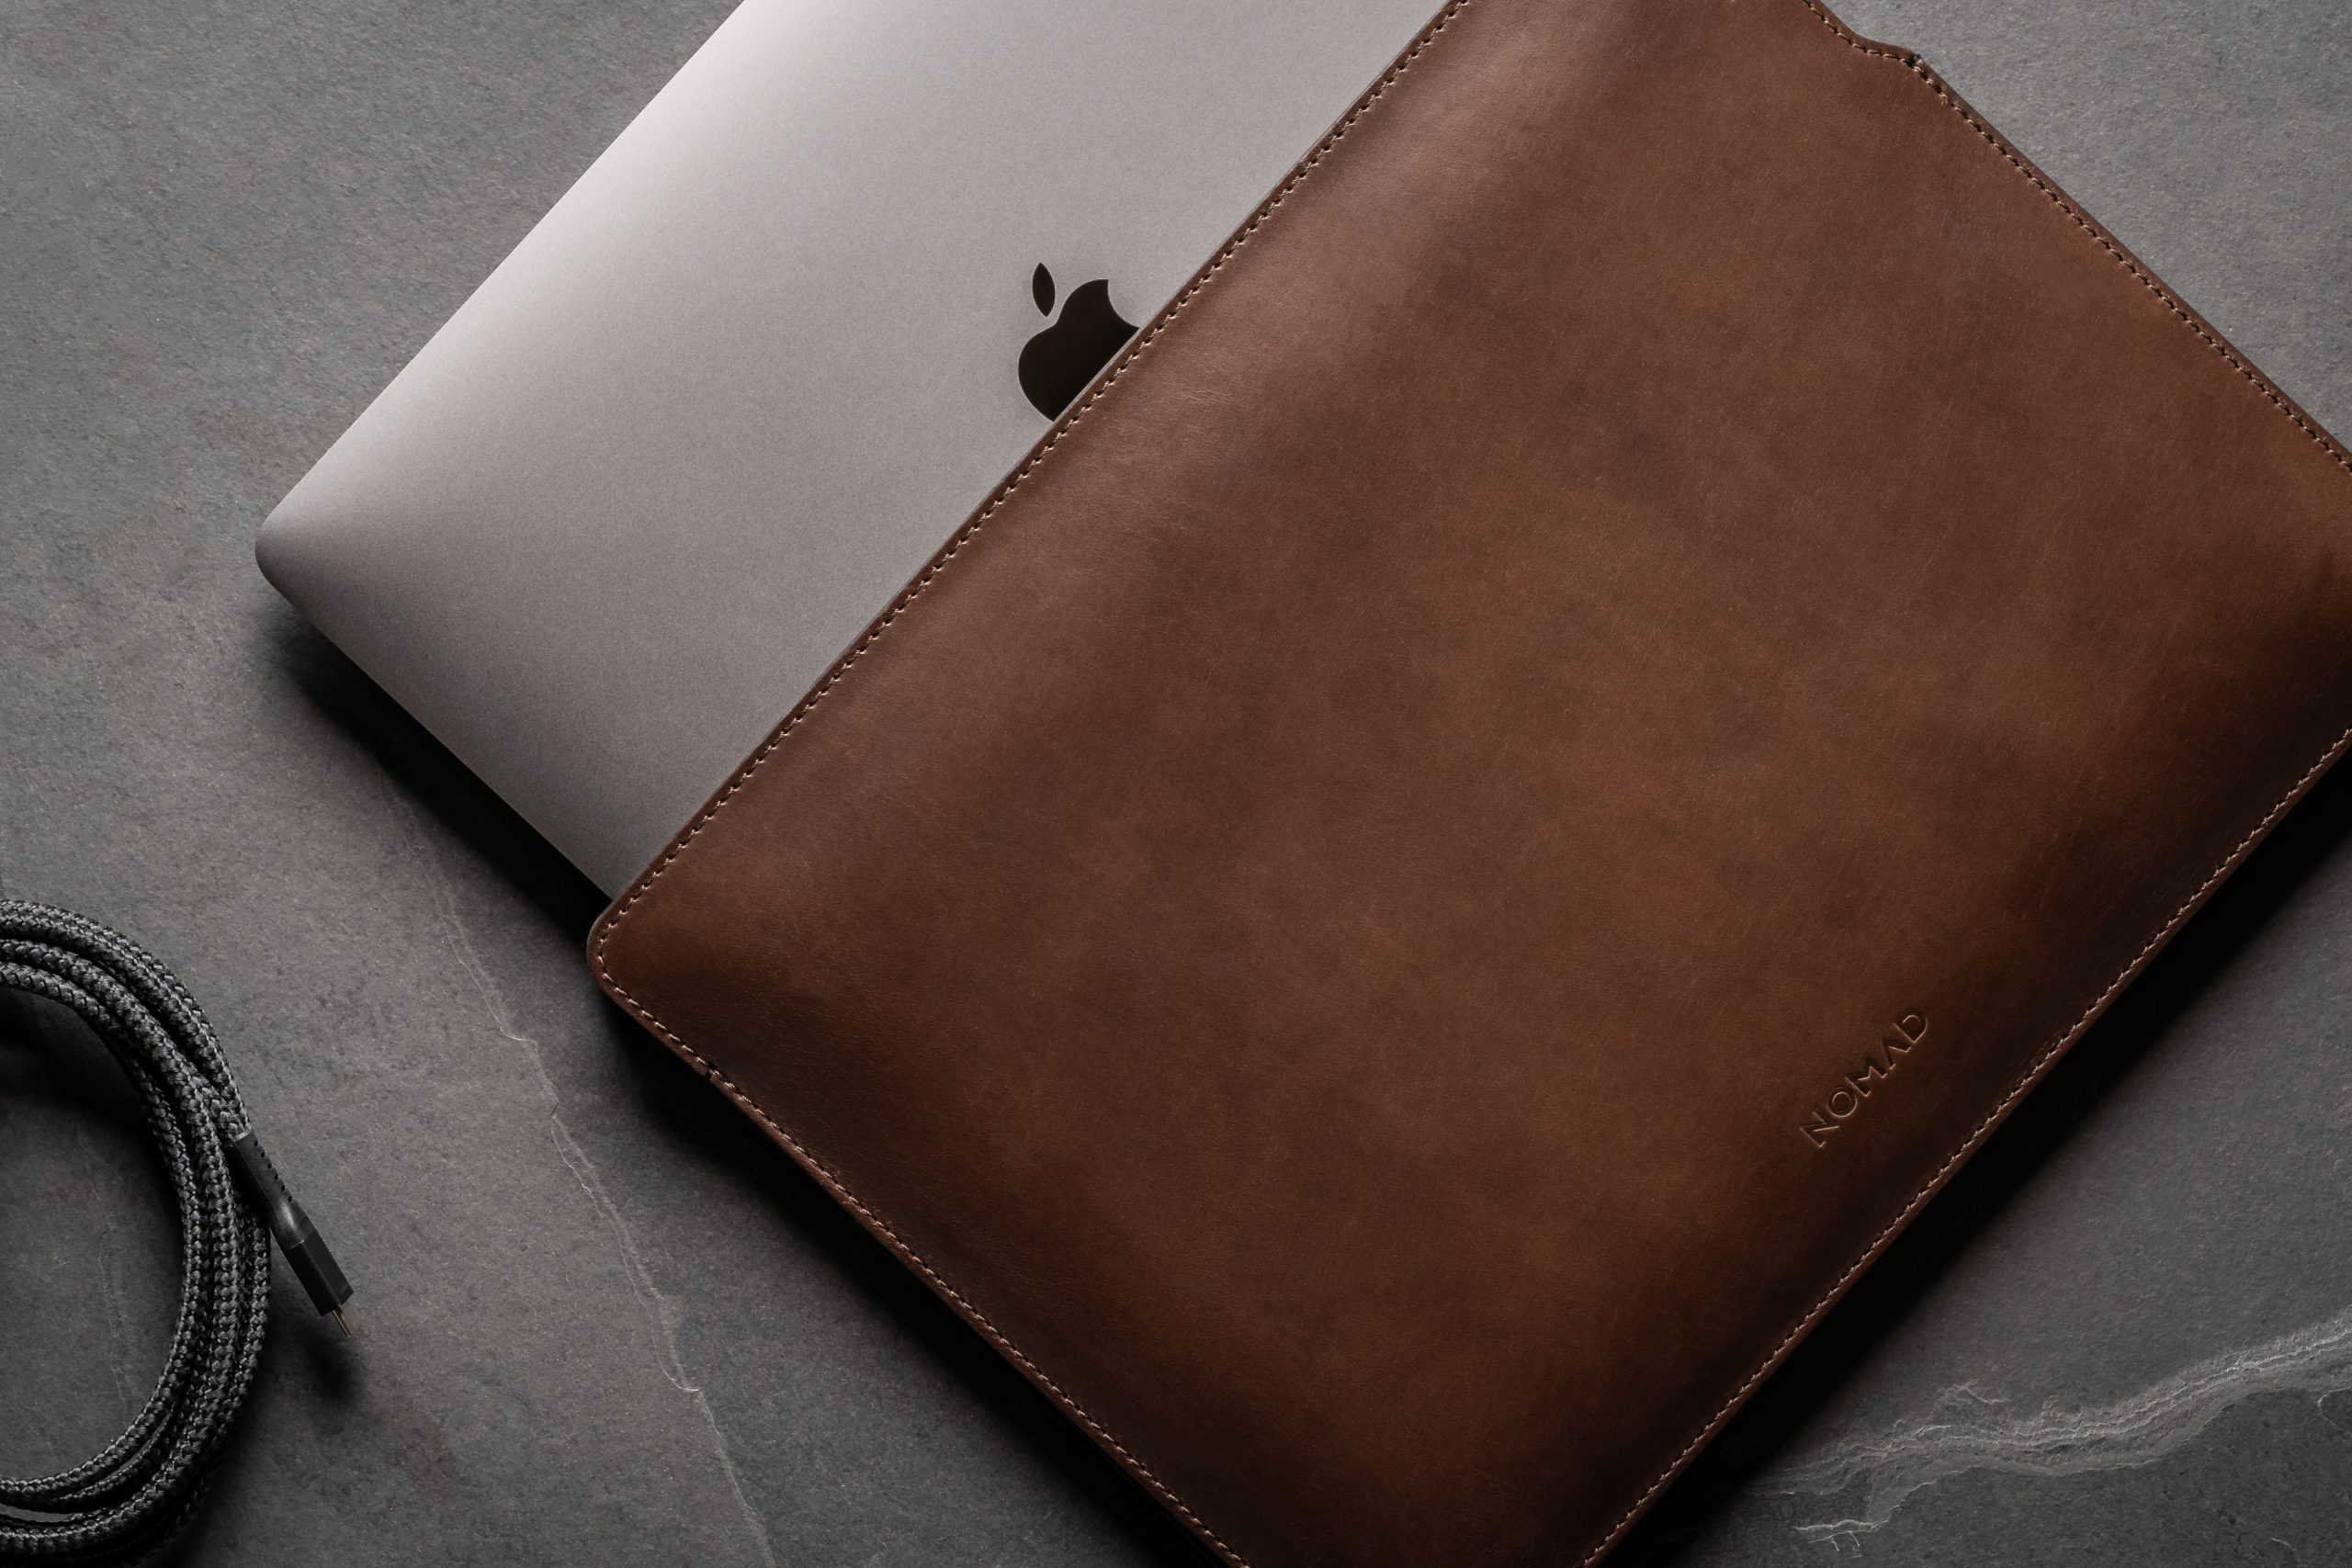 Nomad-MacBook-Sleeve-16-Inch